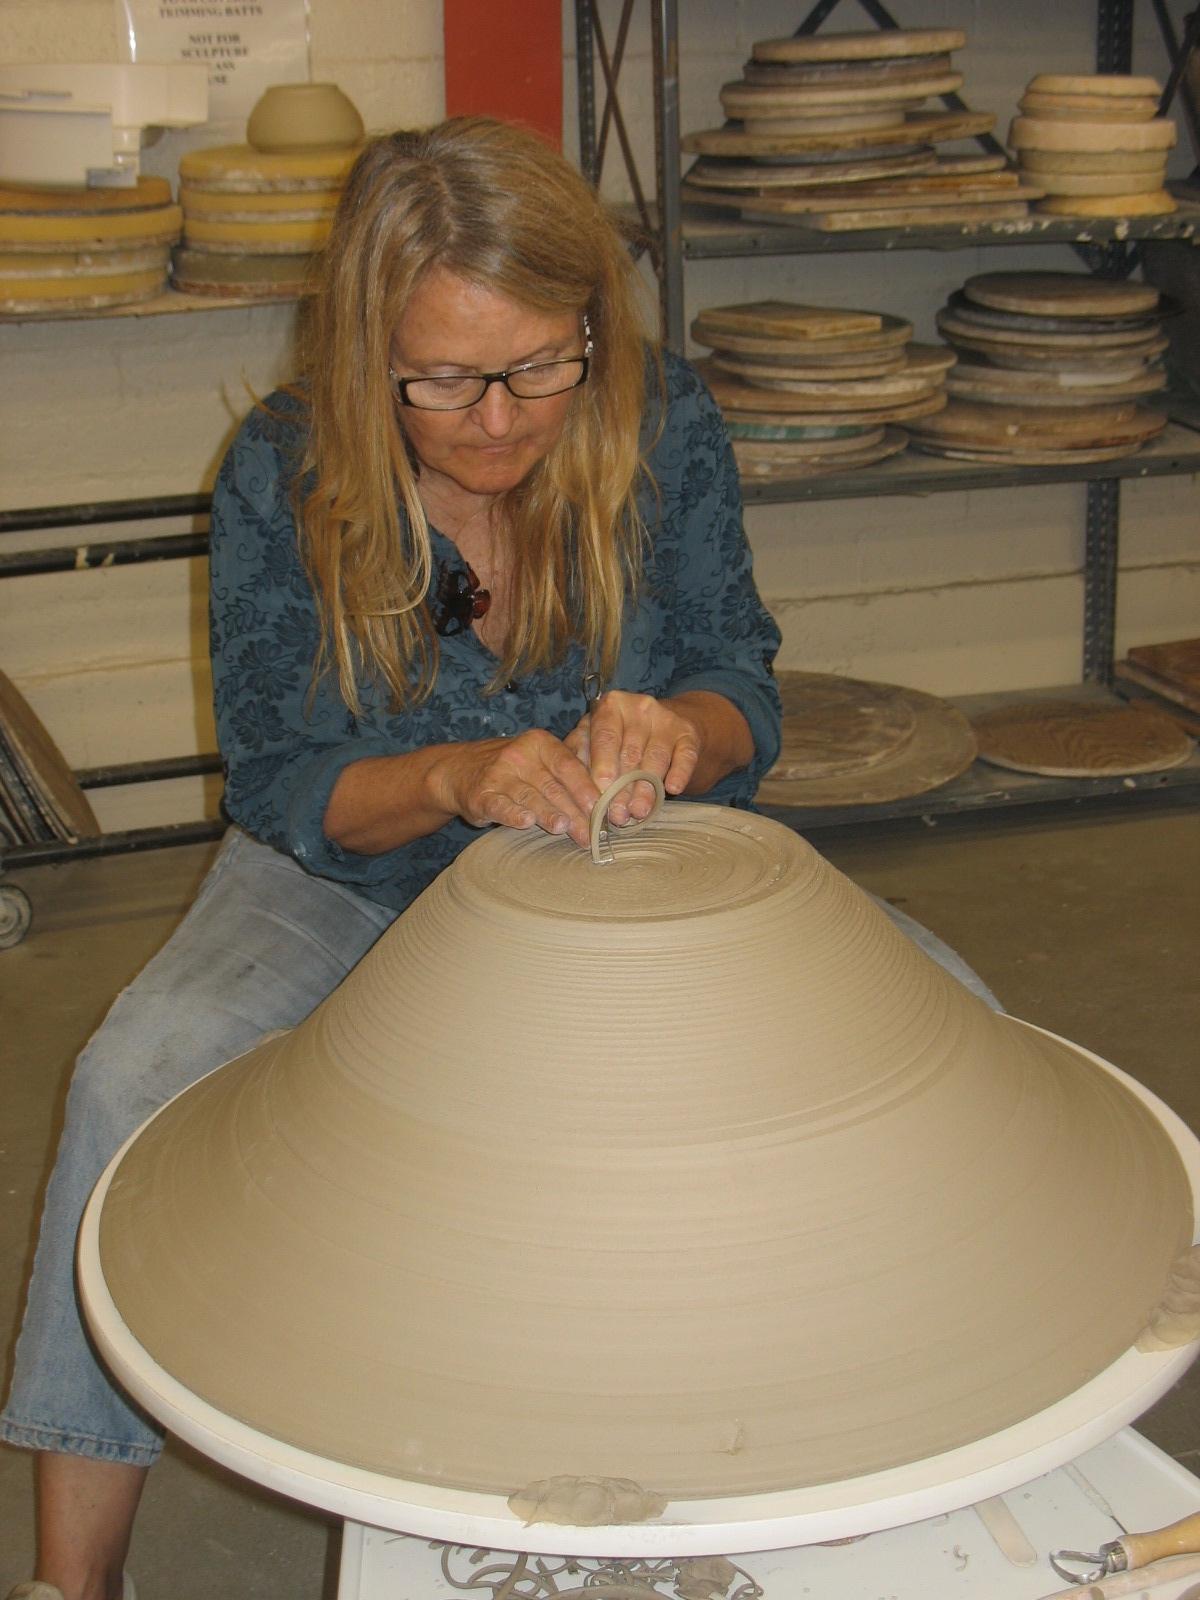 Trimming 20 pound bowl